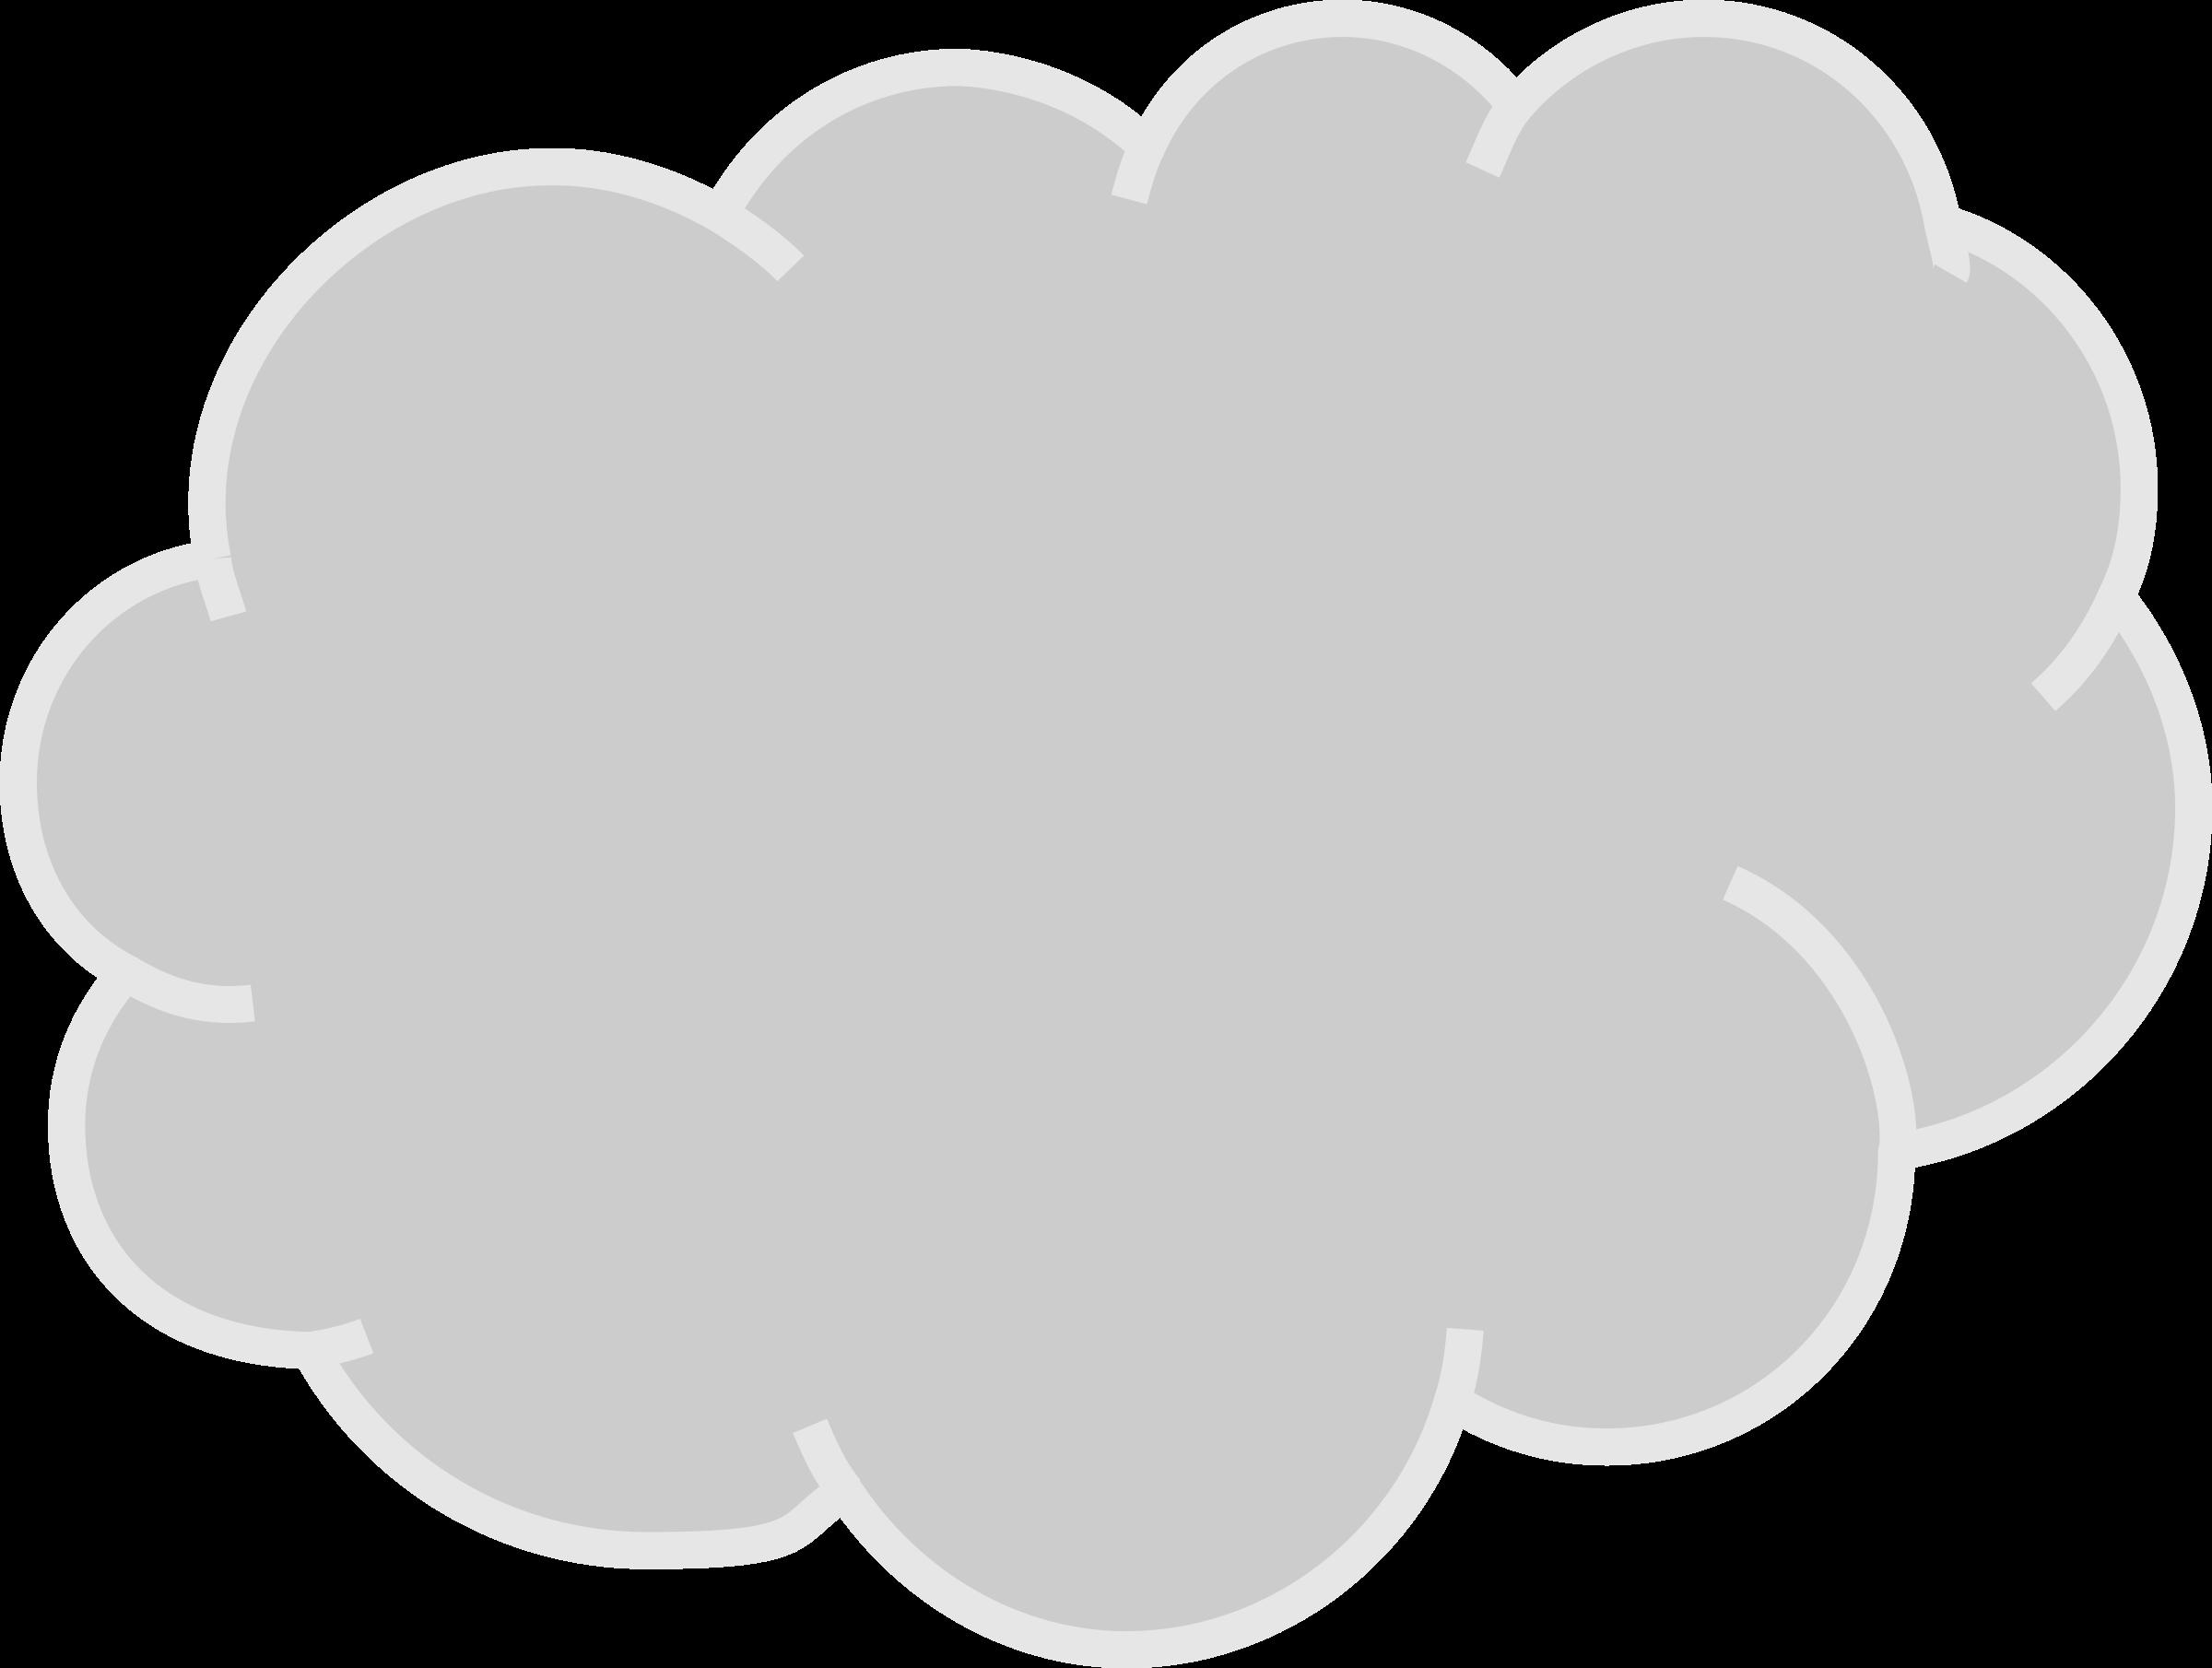 Gas cloud clipart.